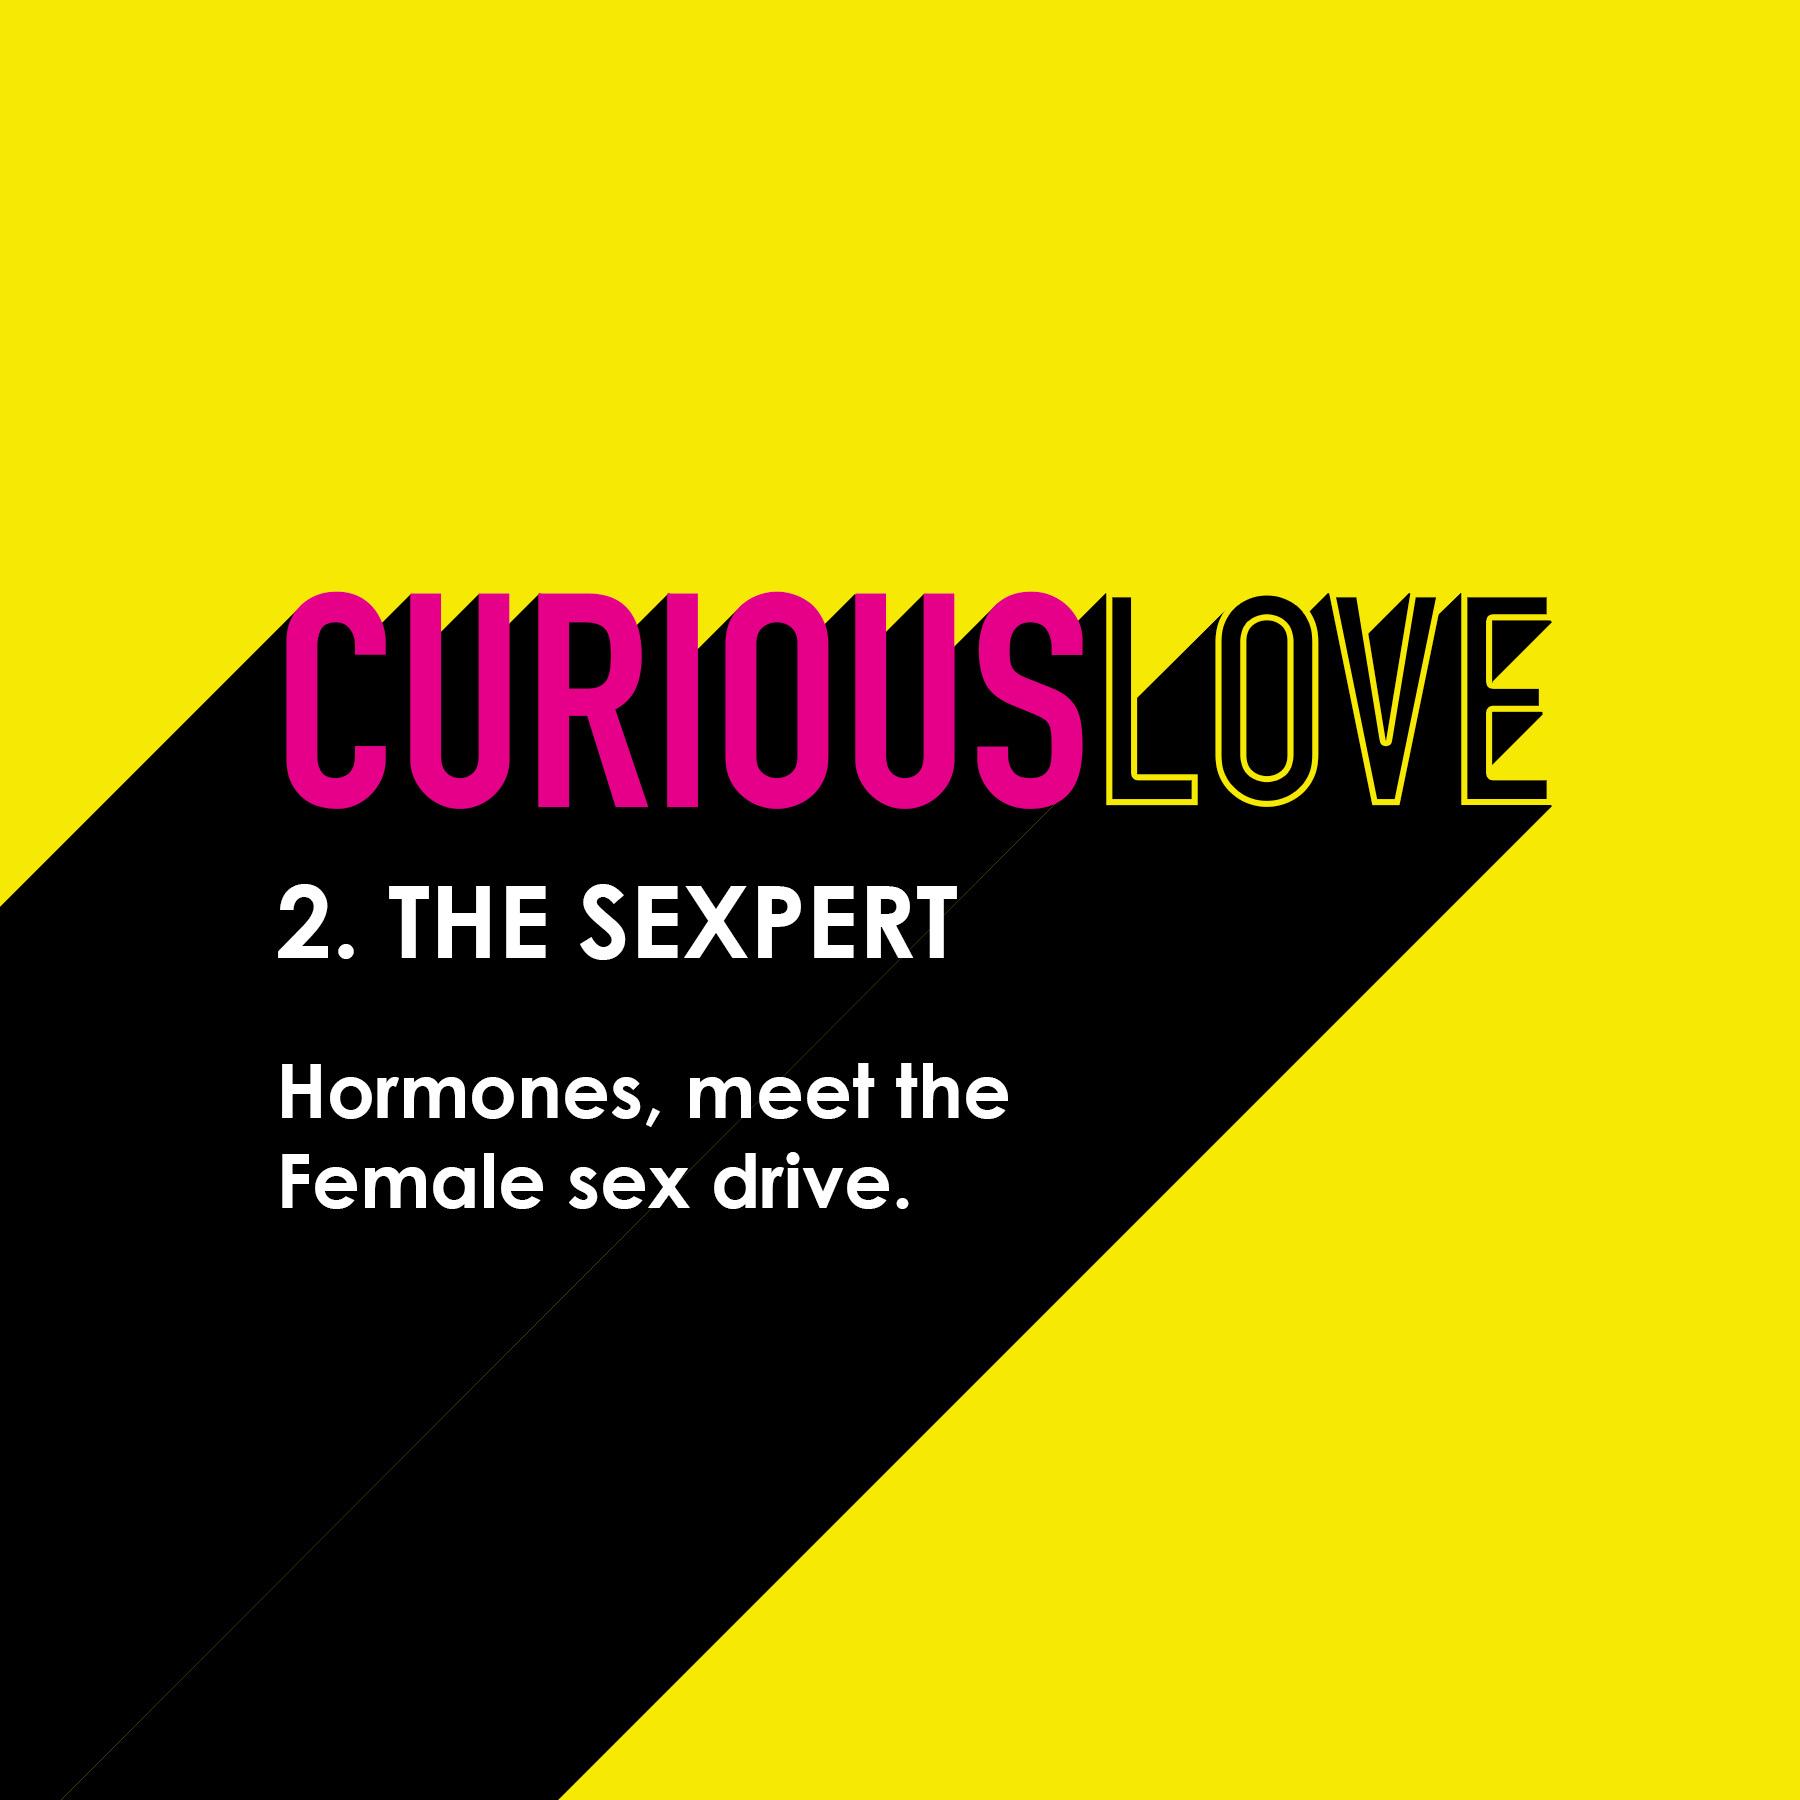 CuriousLove Episode Tagline 2.jpg